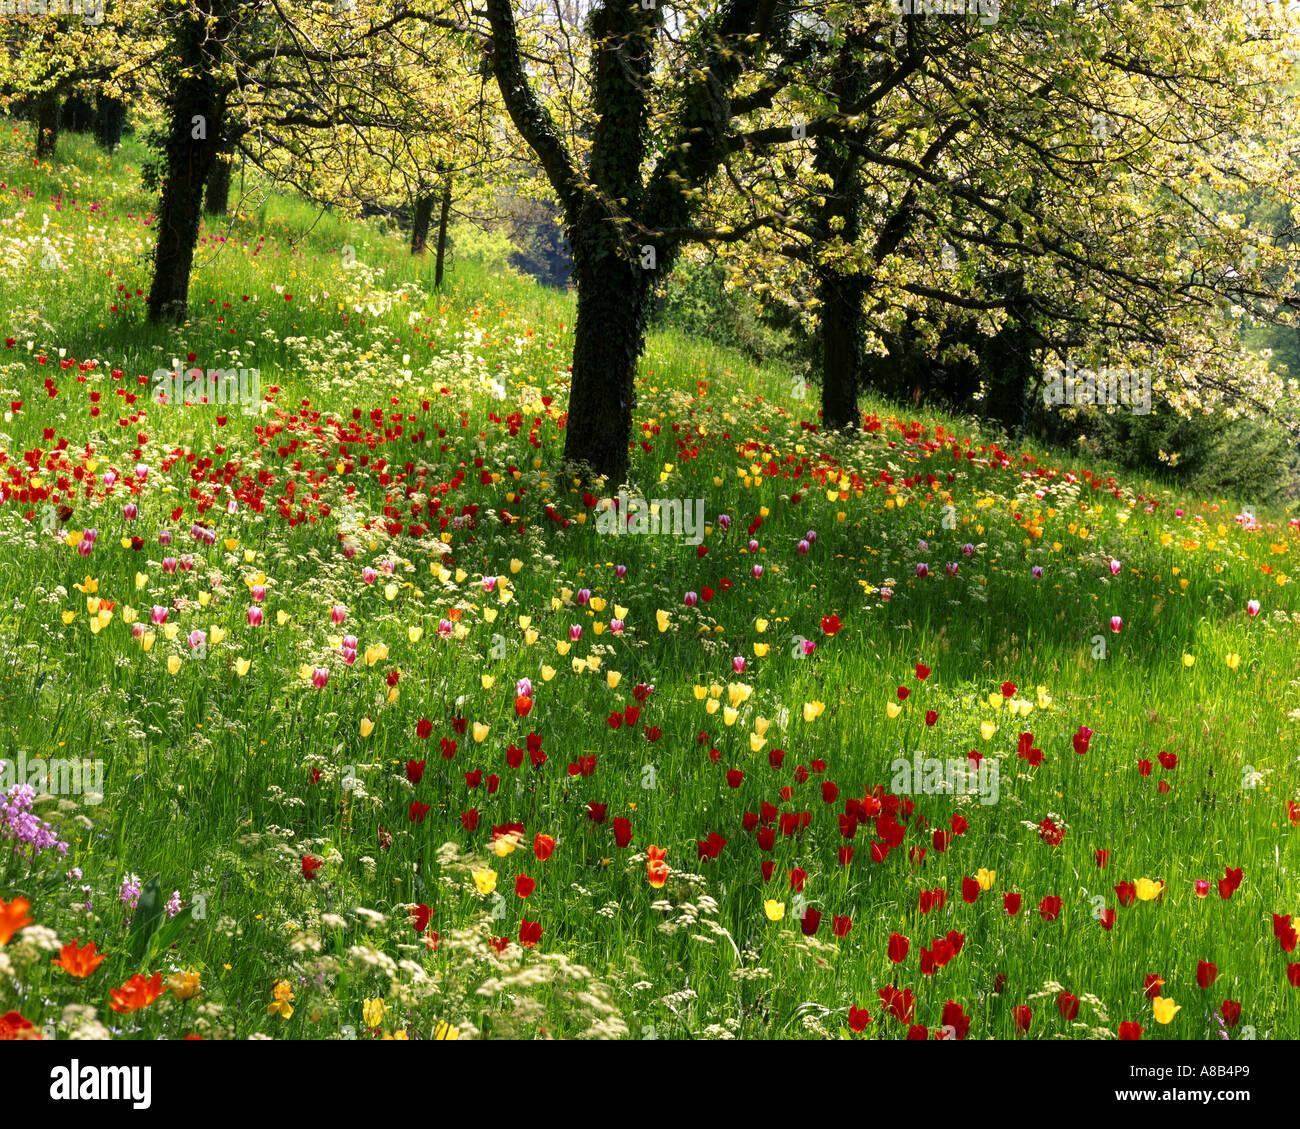 DE - Baden-Württemberg: Frühling auf der Insel Mainau Stockbild